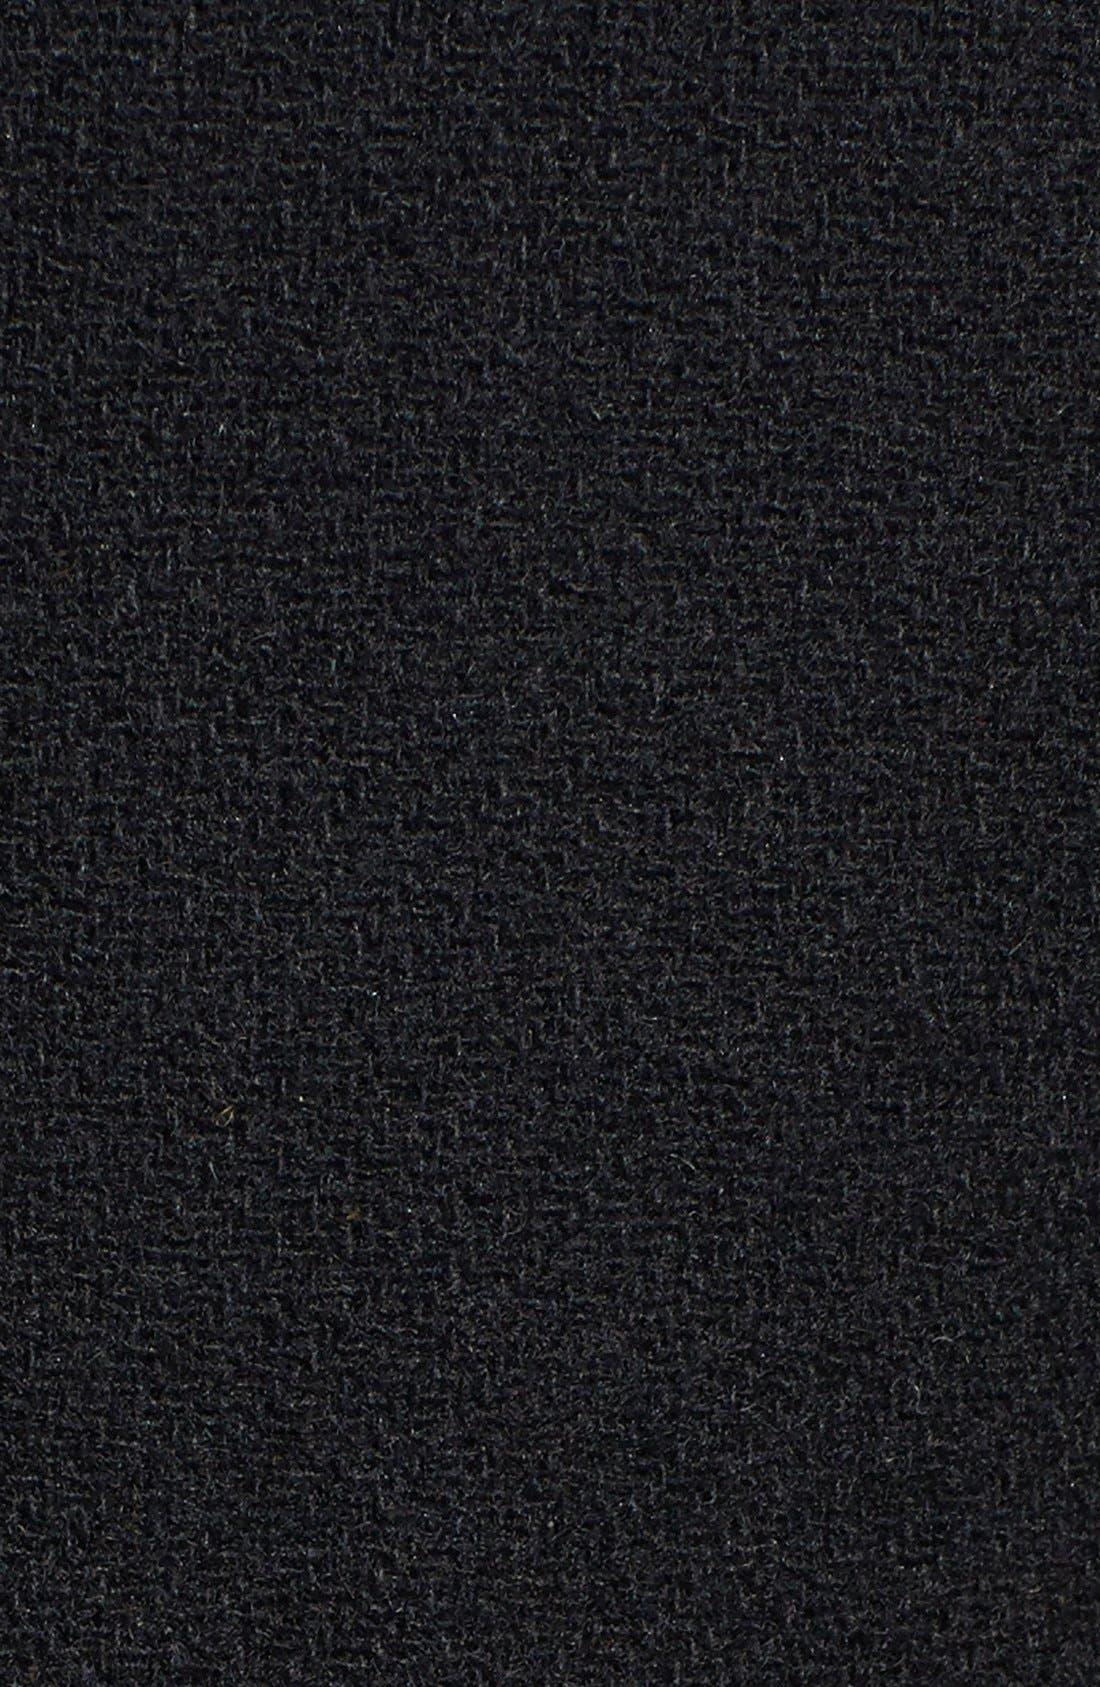 Wool Blend Duffle Coat,                             Alternate thumbnail 3, color,                             001